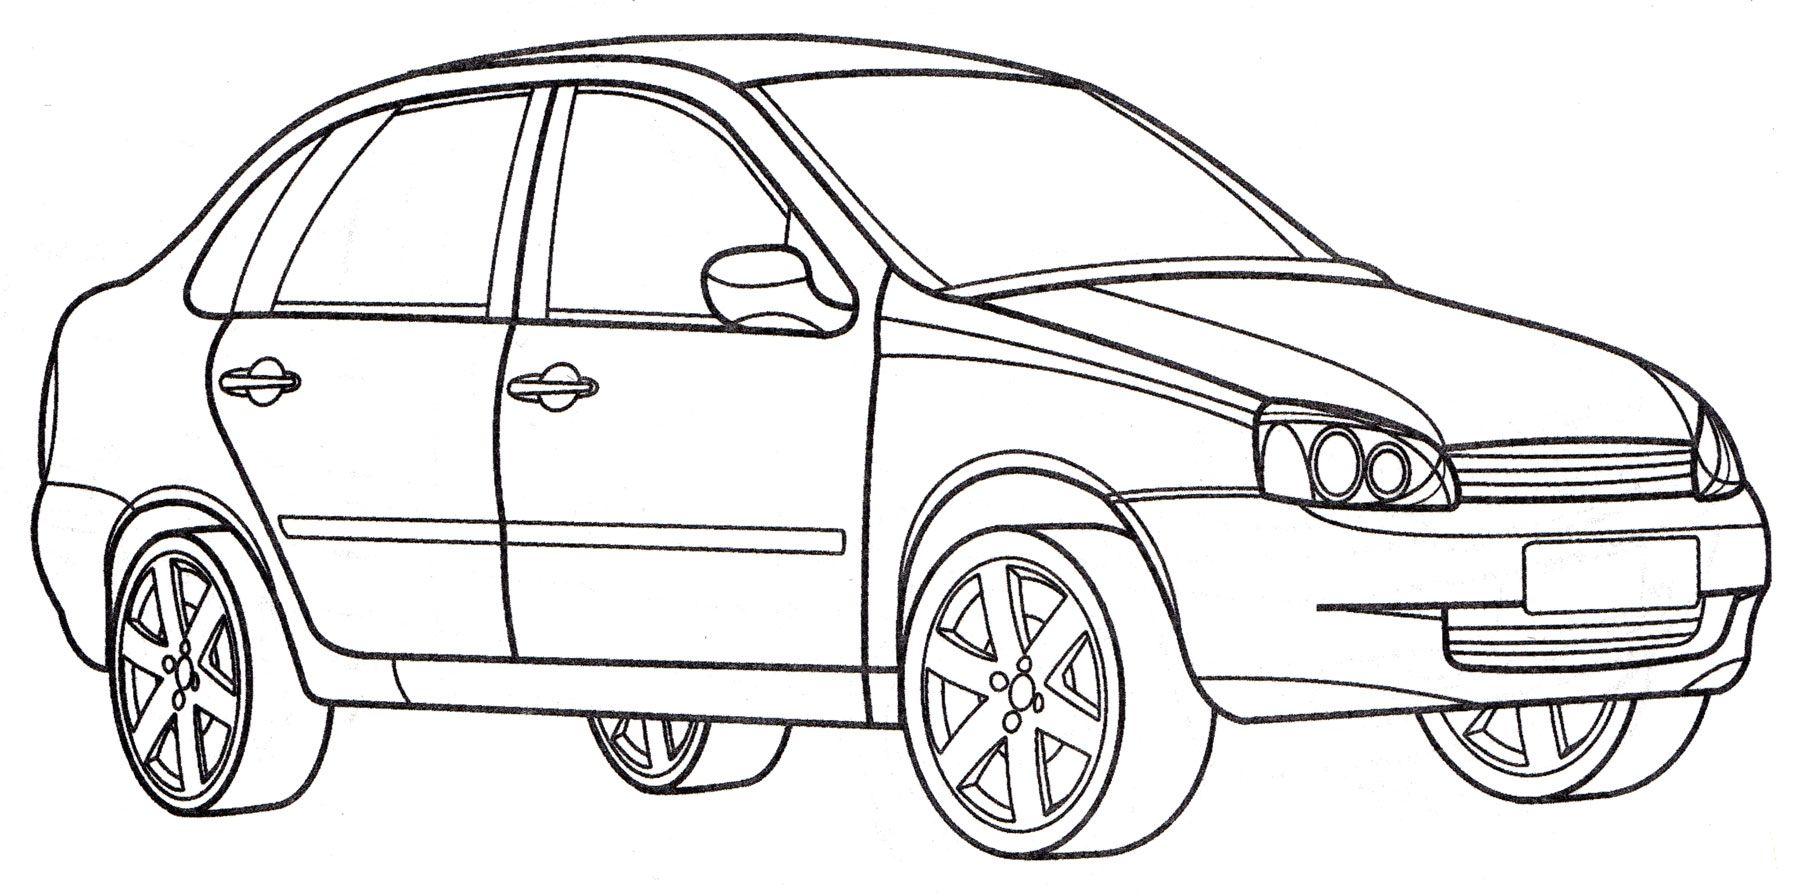 Raskraska Lada Kalina Raspechatat Besplatno V 2020 G Raskraski Ladan Avtomobil